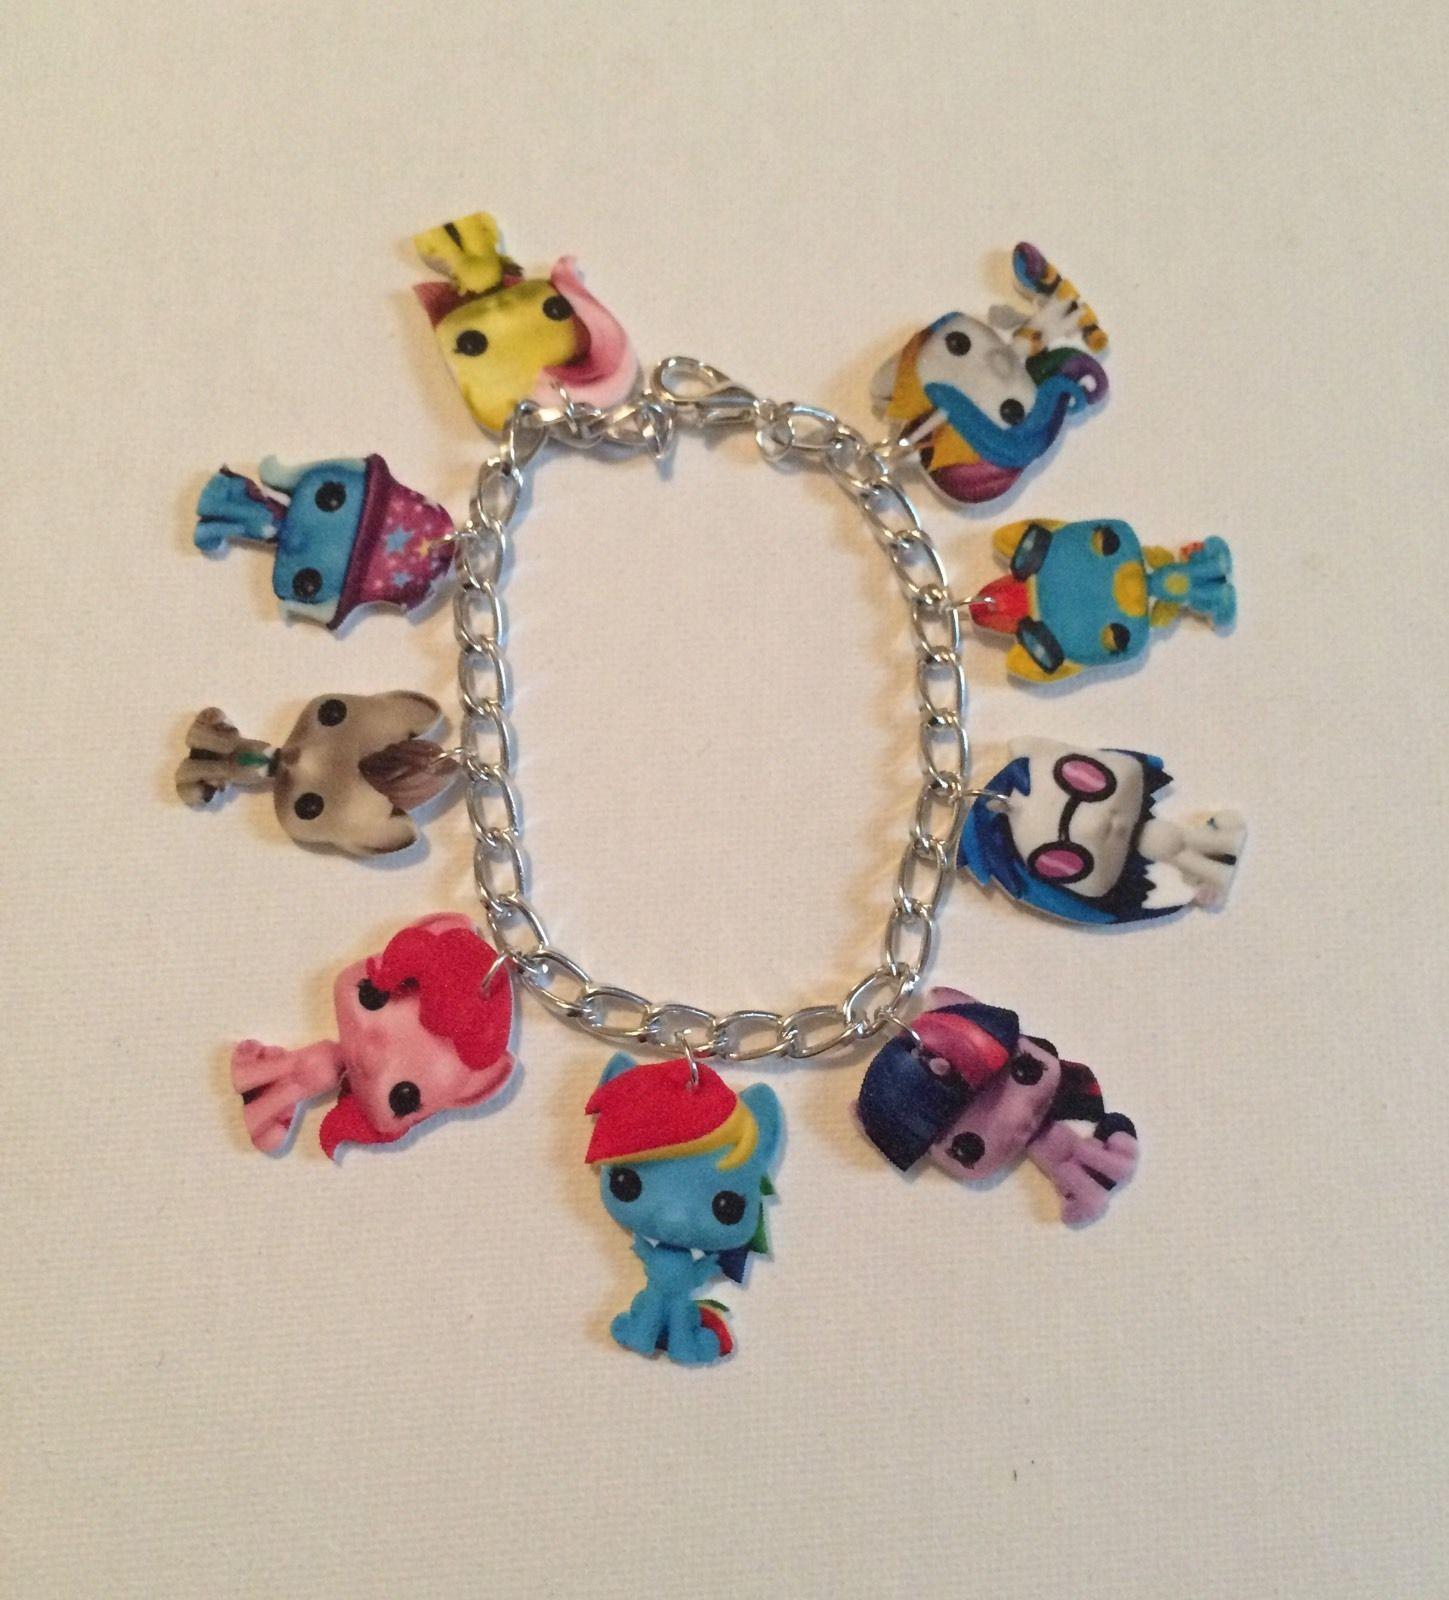 my pony dolls charm bracelet handmade plastic